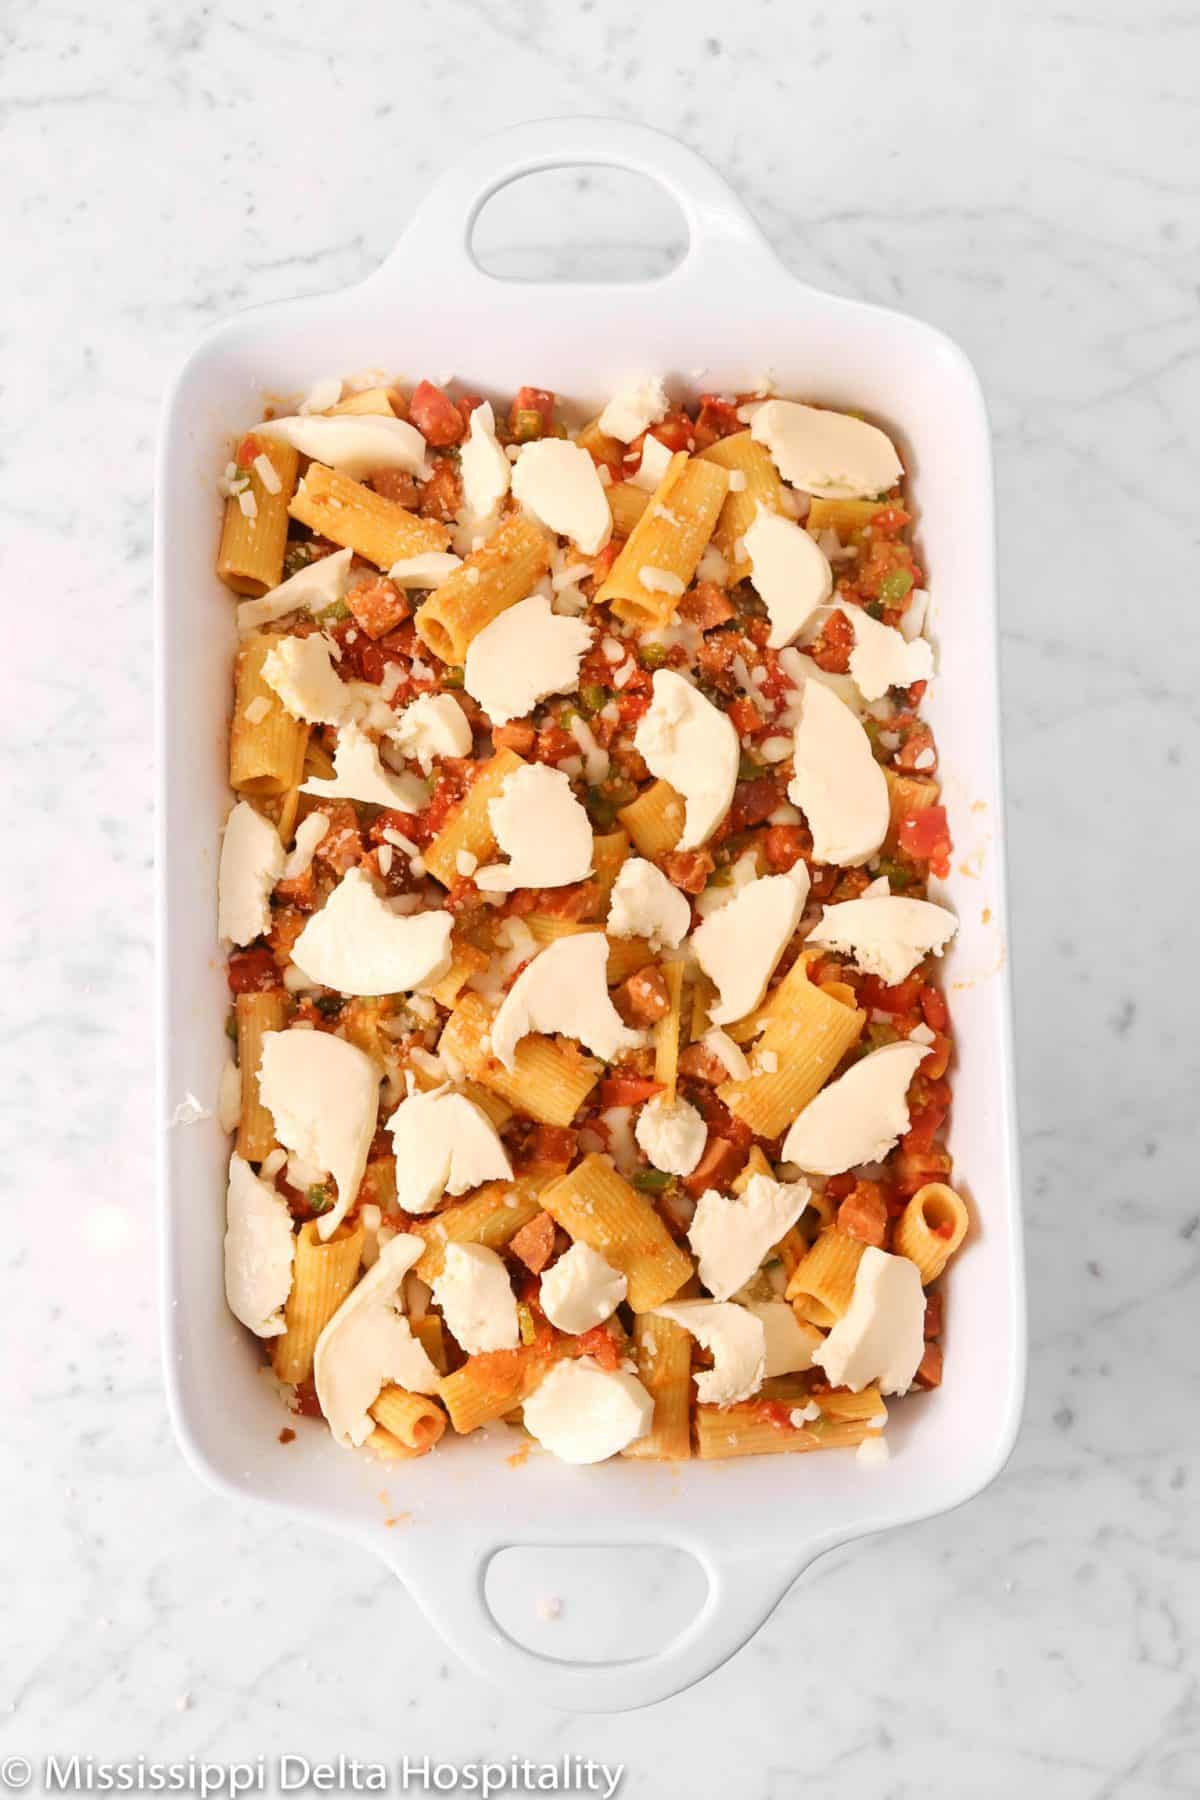 mozzarella cheese added on top of rigatoni mixture